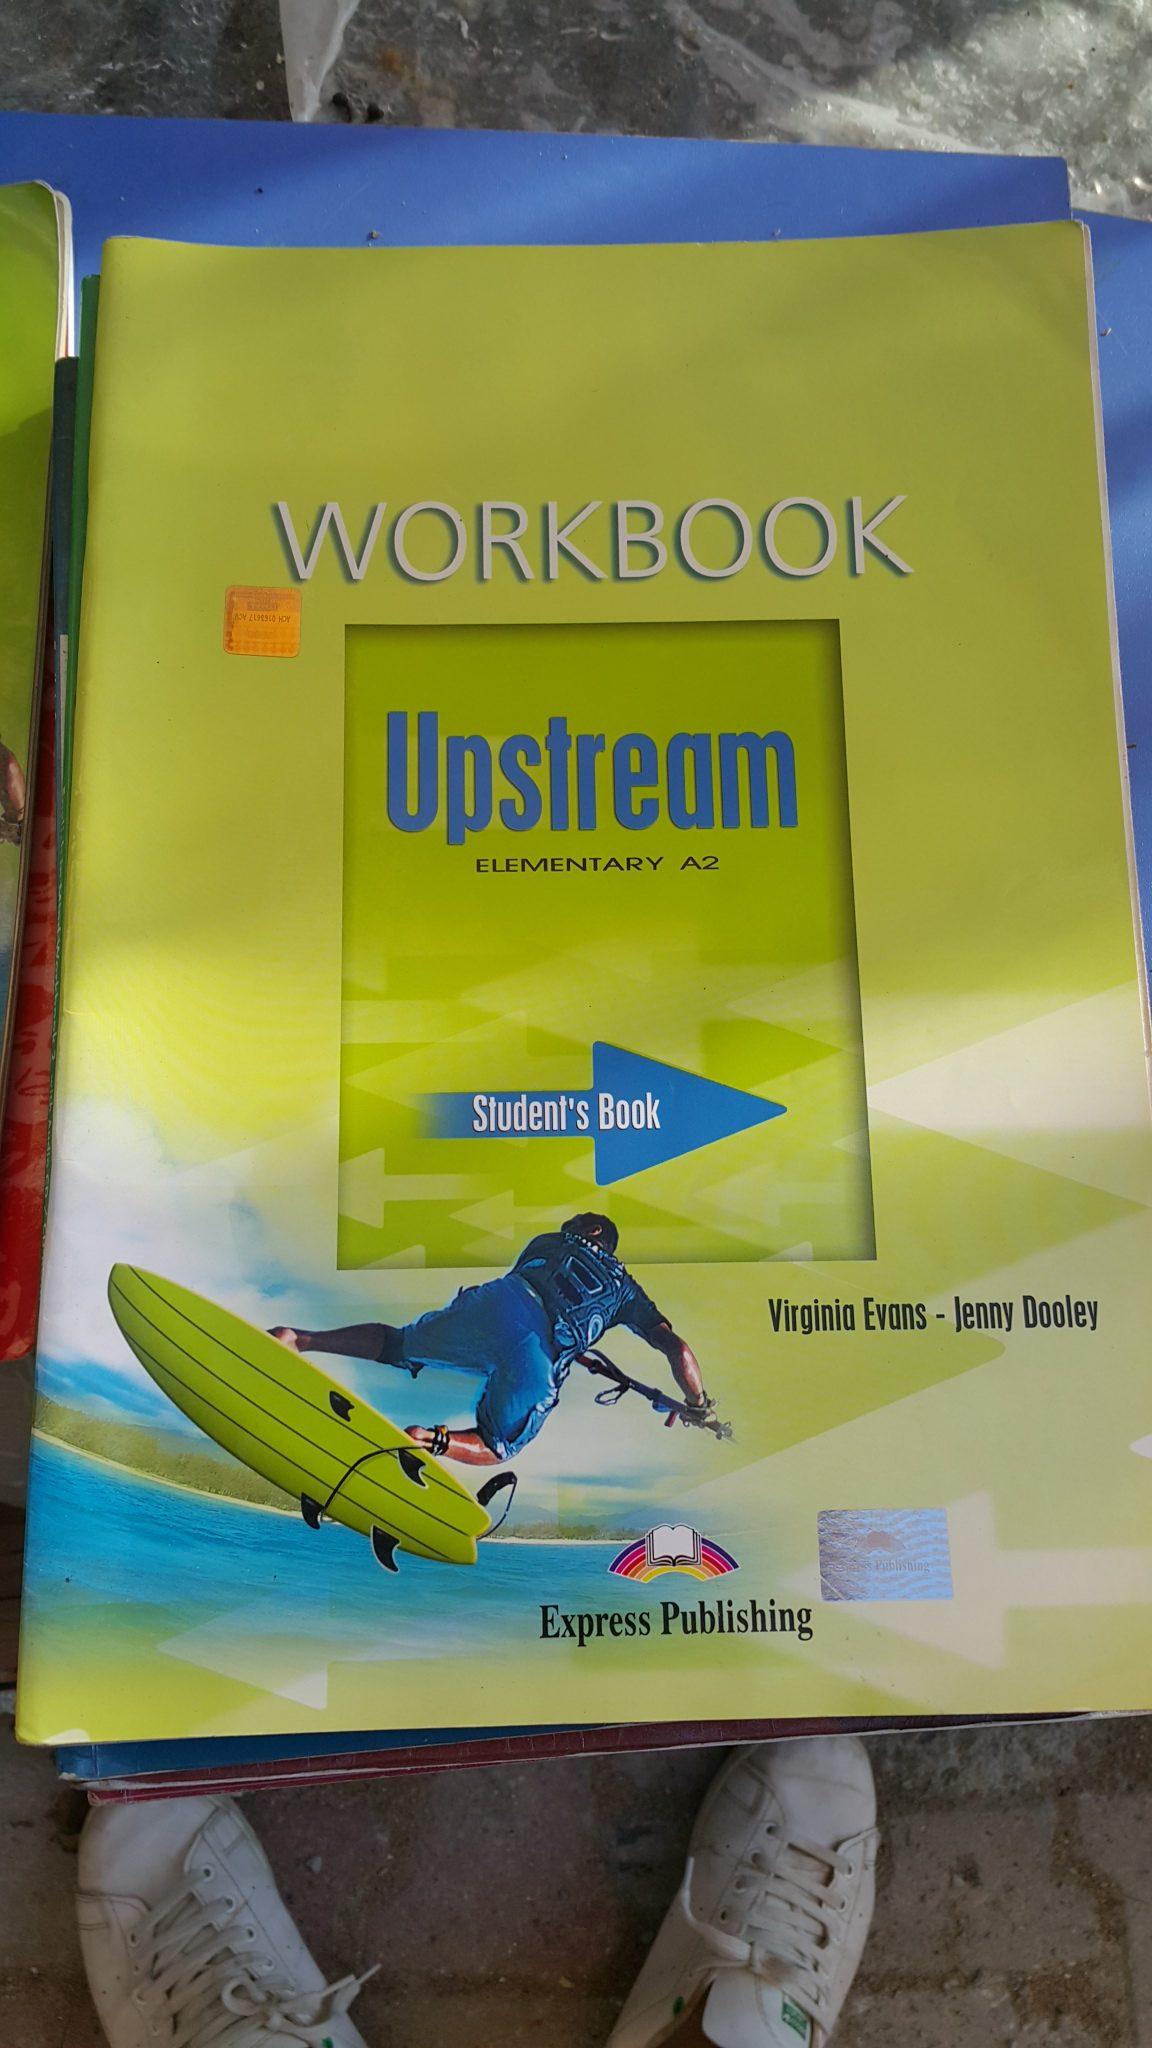 UPSTREAM (STUDENT BOOK) V.EVANS-J.DOOLEY